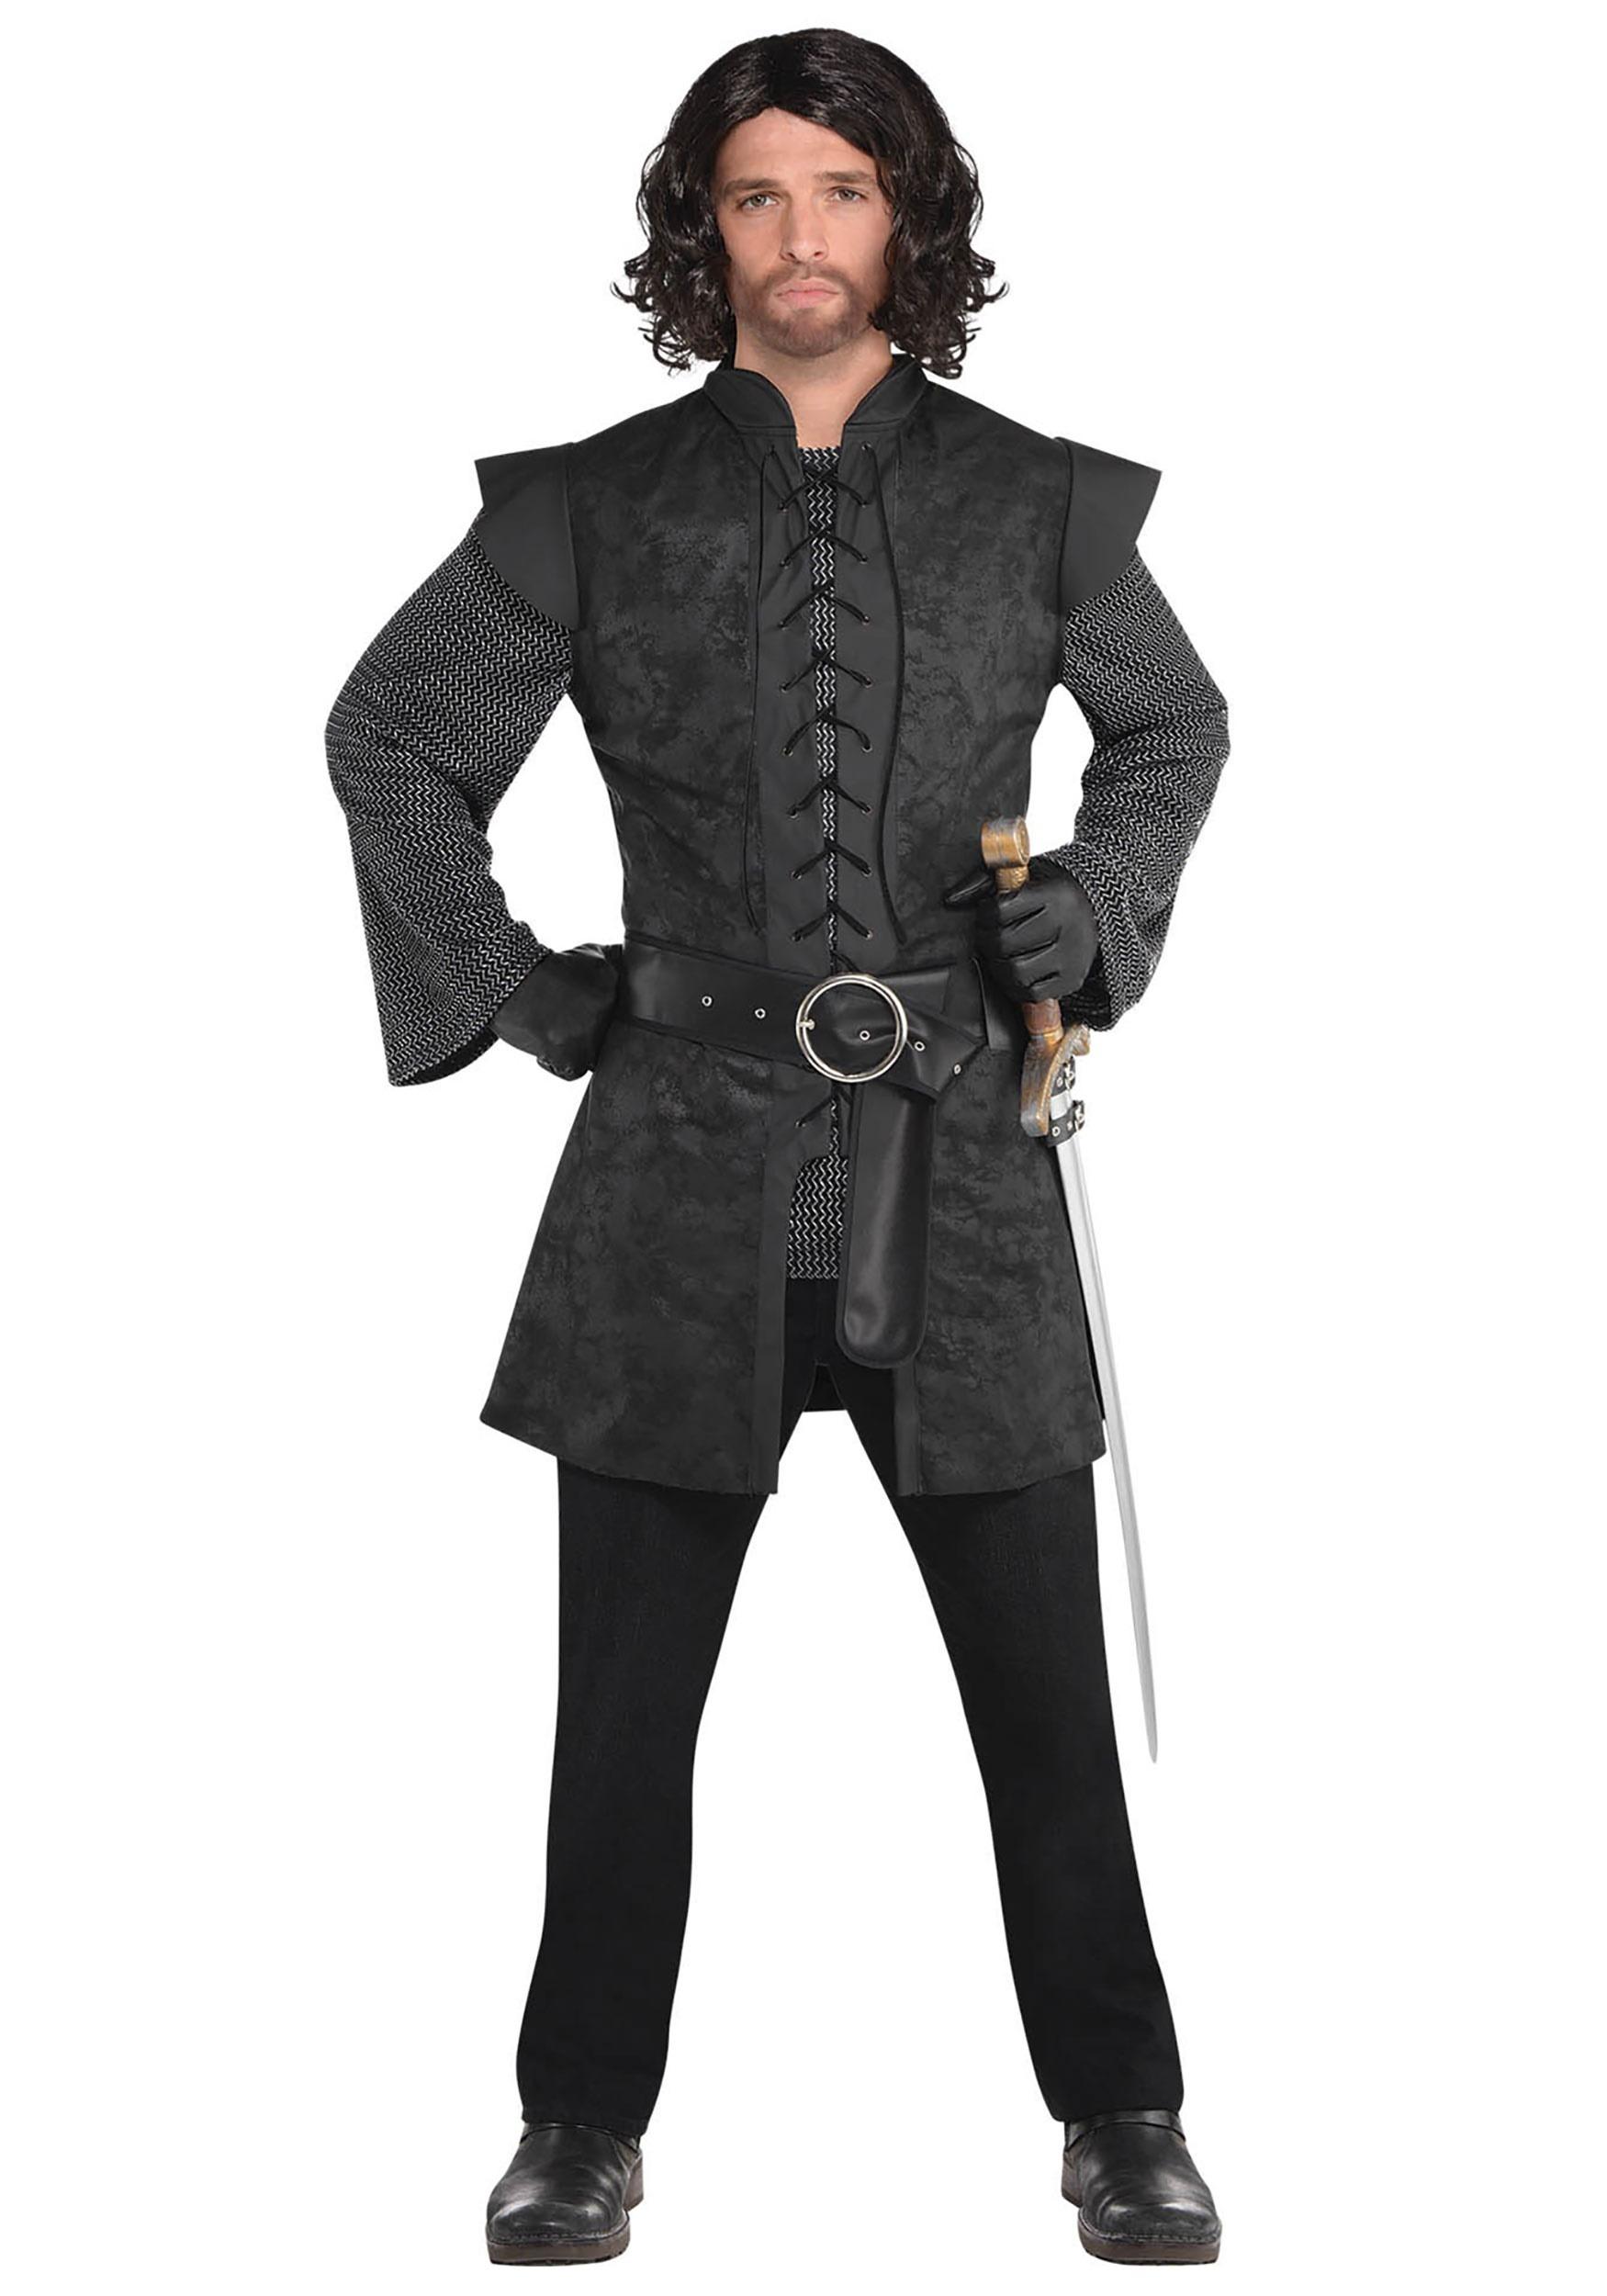 Warrior_Black_Tunic_Mens_Costume